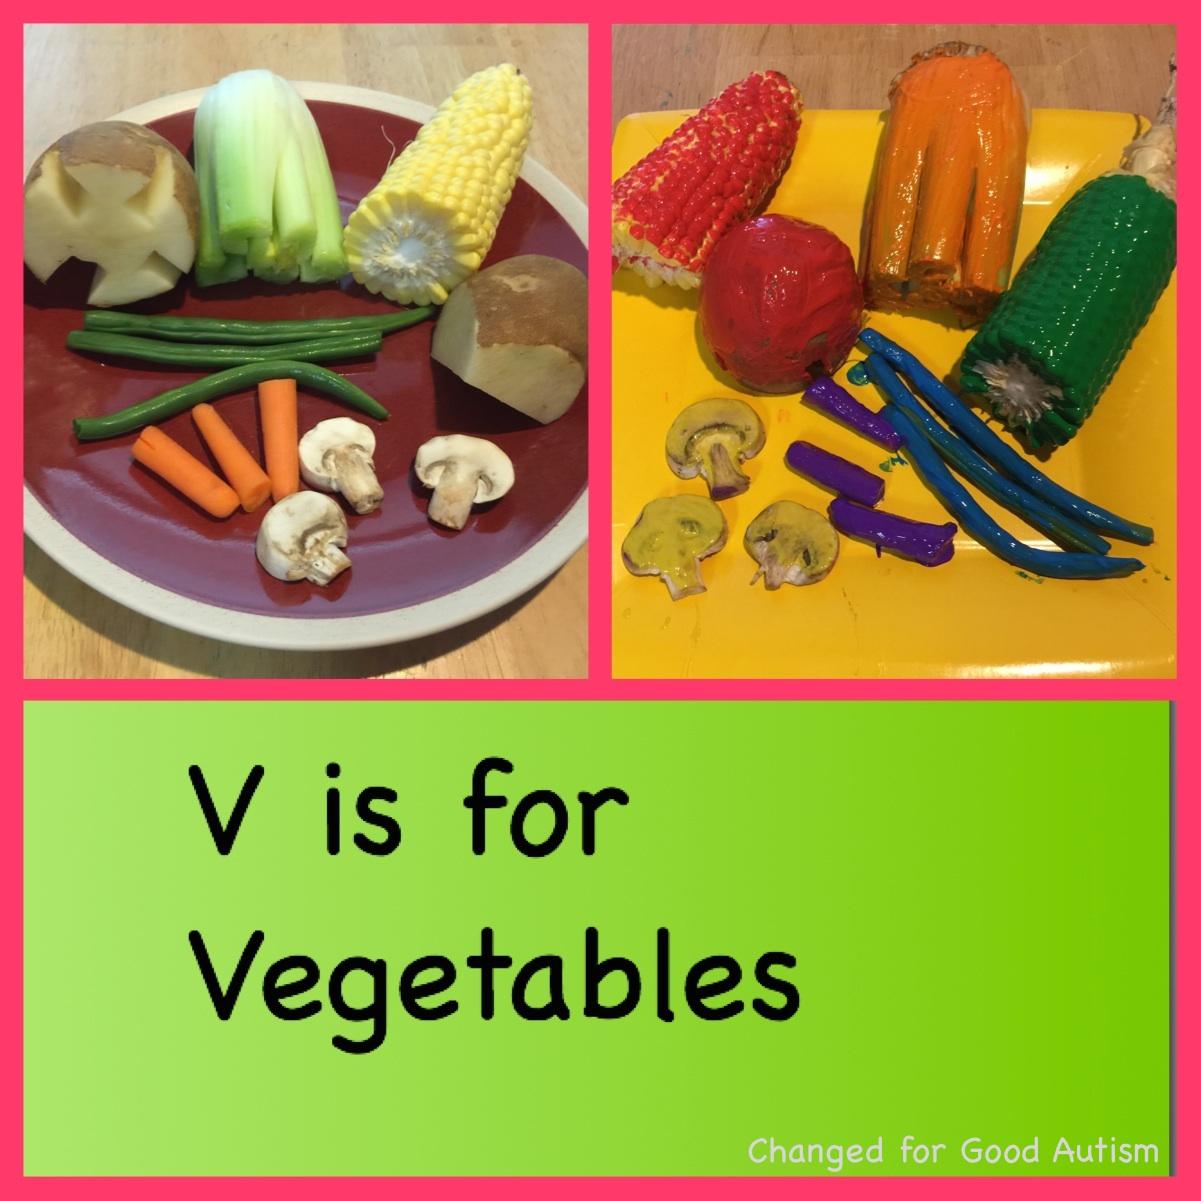 V Is For Vegetables Changed For Good: V is...